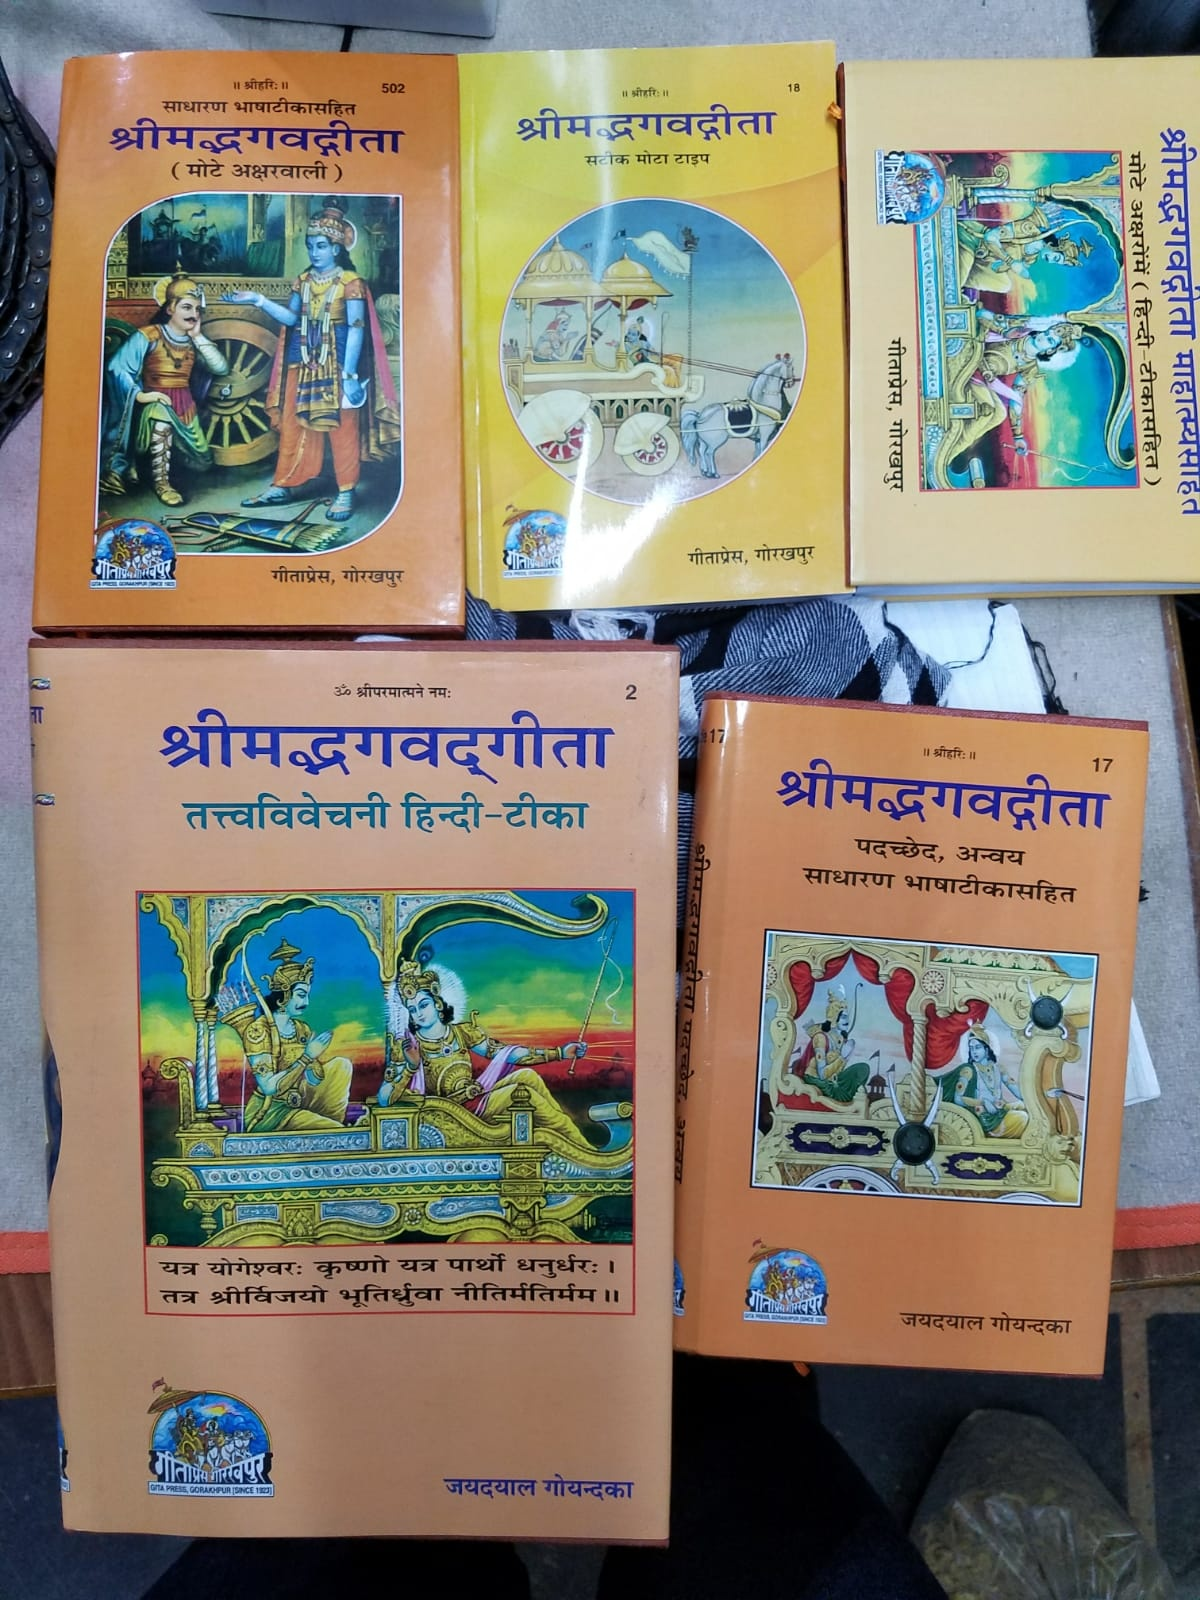 If lust leads to destruction according to Bhagavad Gita then